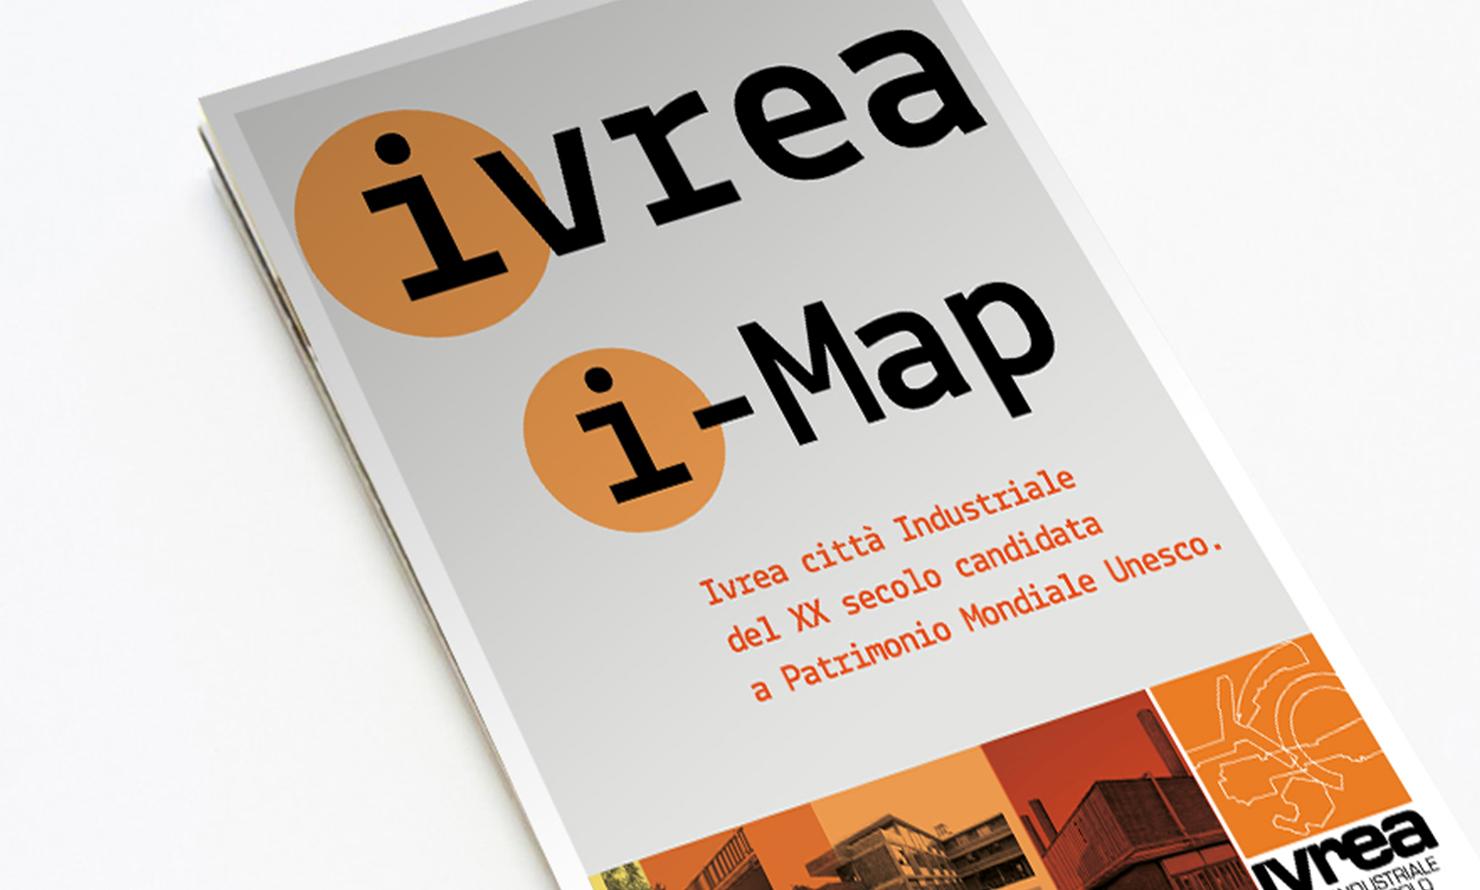 https://www.kubelibre.com/uploads/Slider-work-tutti-clienti/ivrea-e-unesco-città-industriale-del-xx-secolo-1.jpg